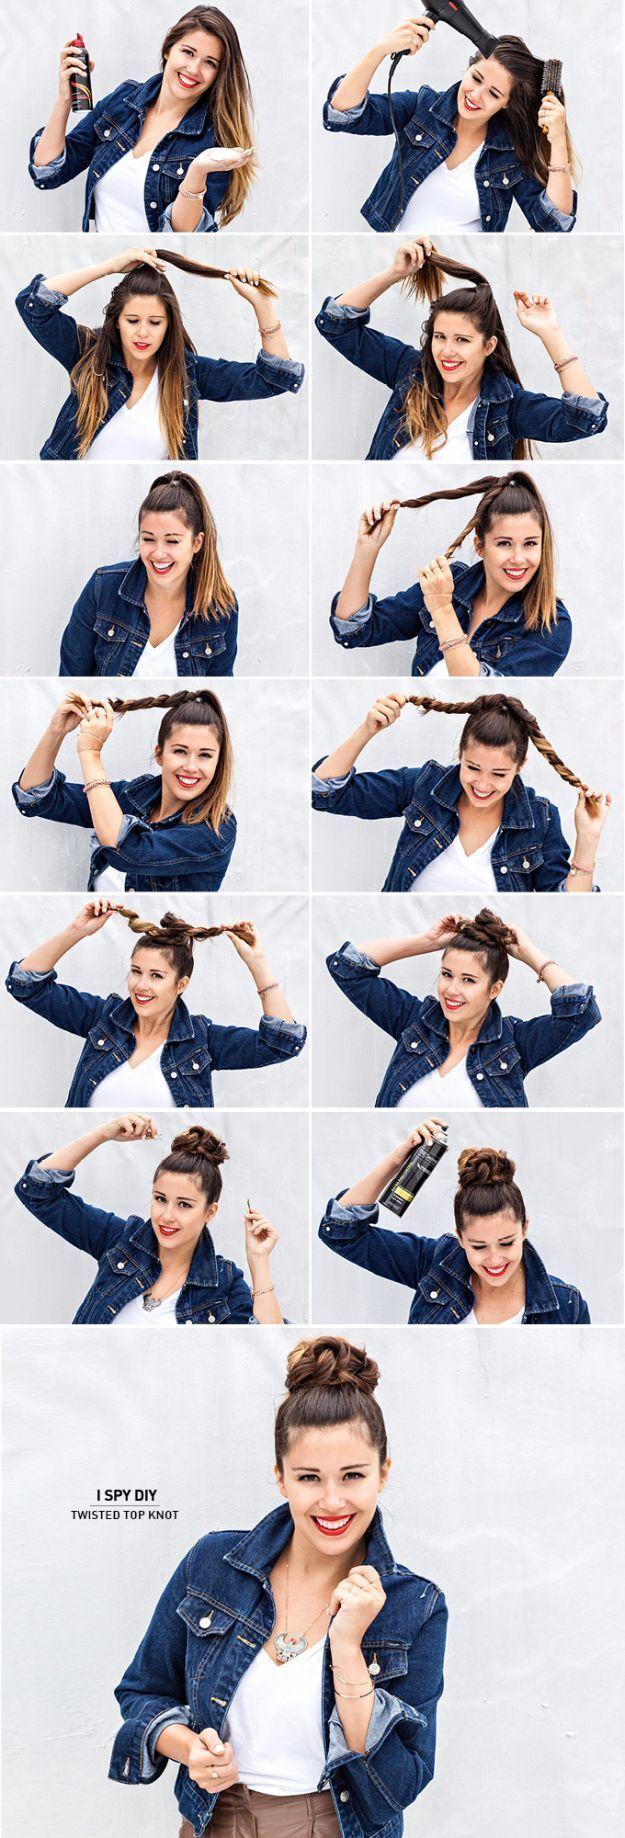 #Frisuren #Kurze Frisuren #Kurze Haare ... - Fashion 2018 - #cool #die #Frisur